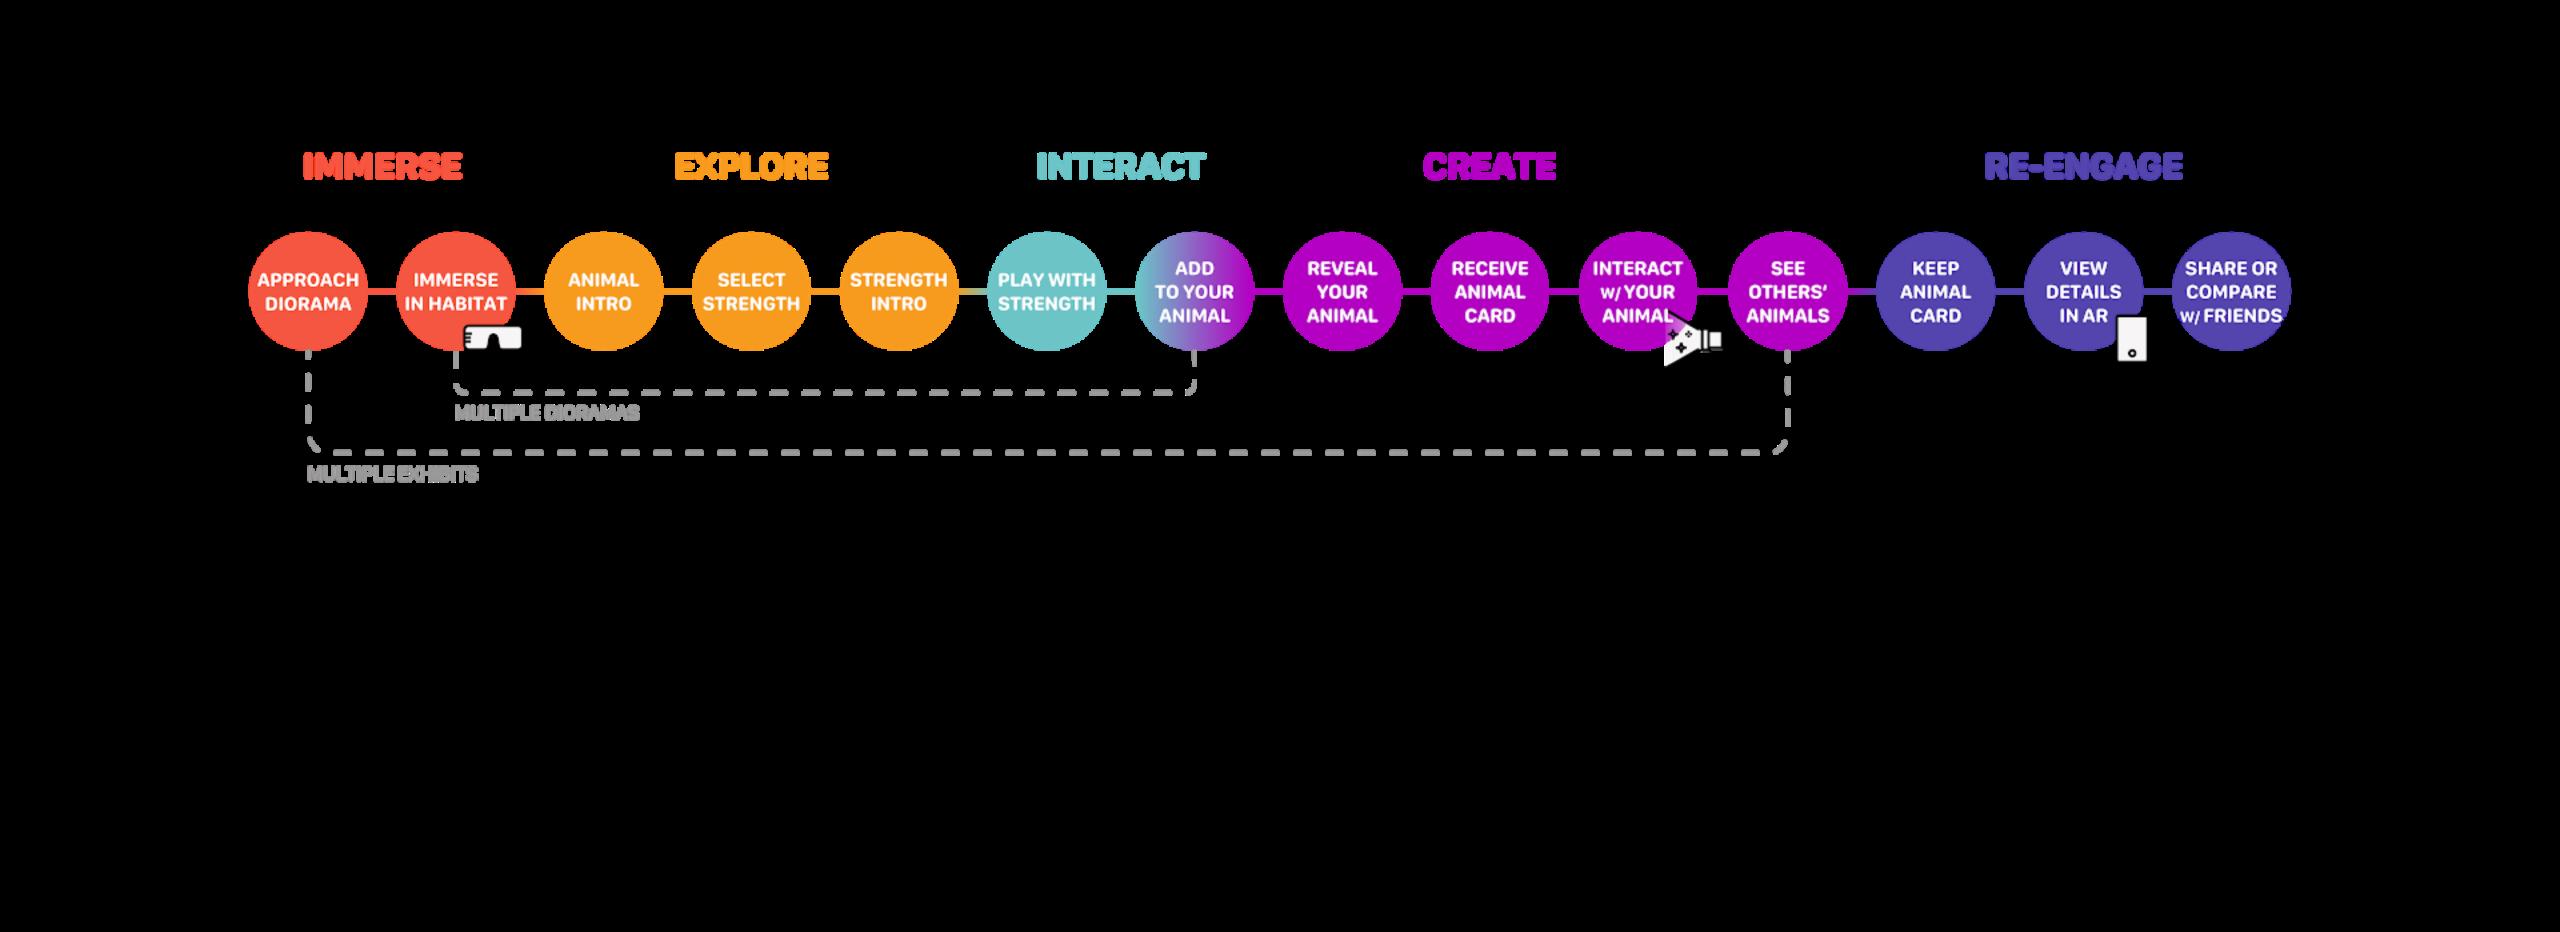 creating-user-journey